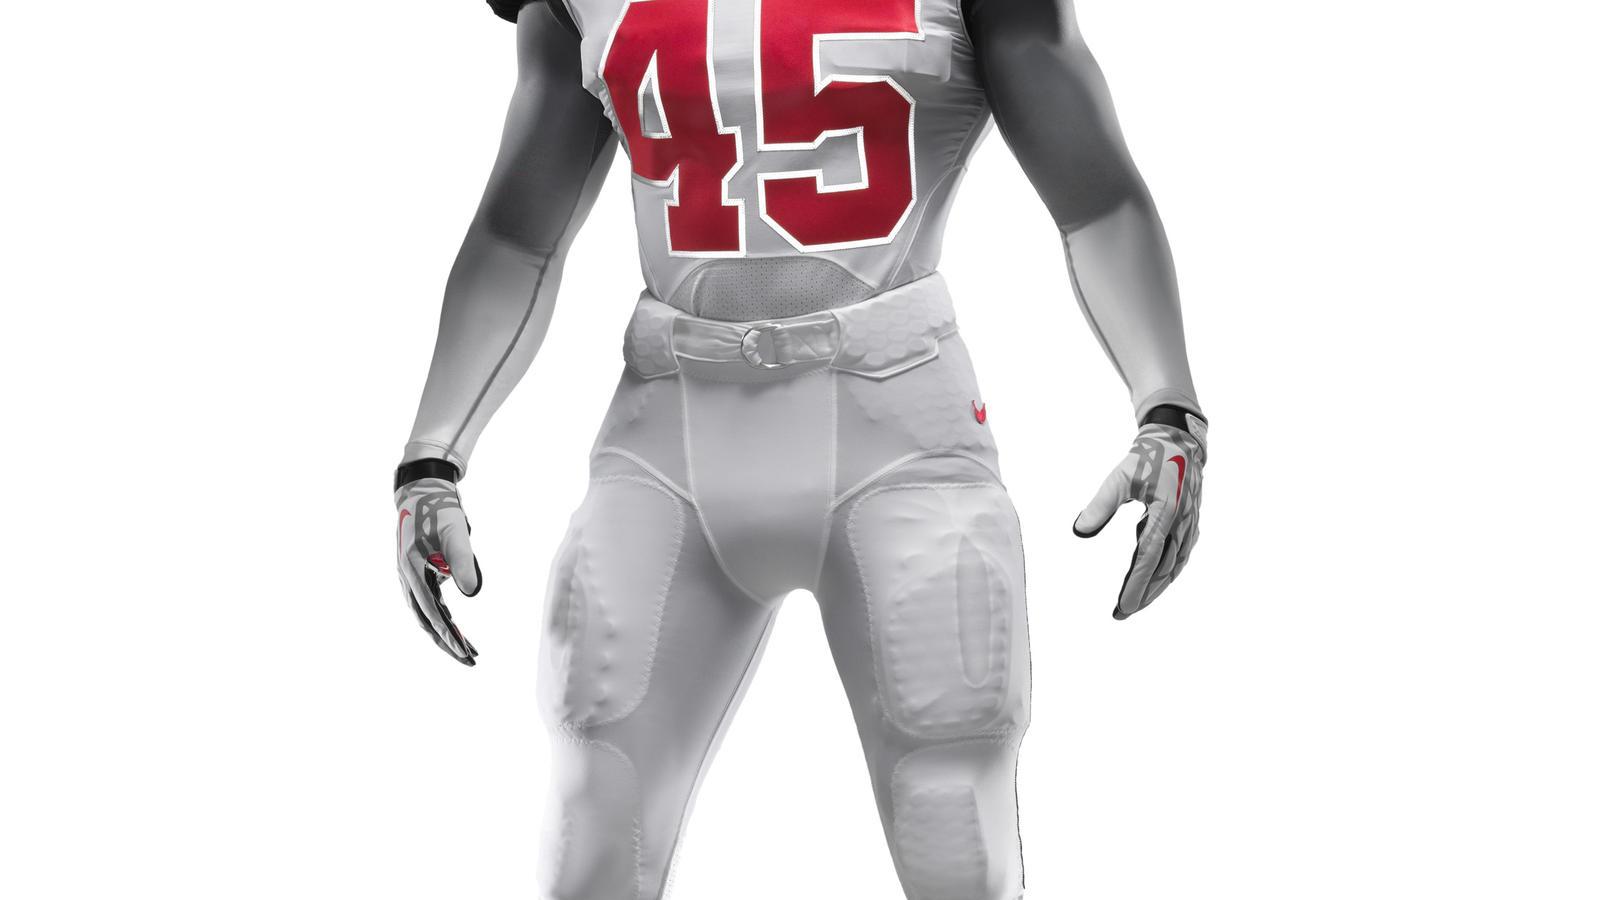 ncaa_fb13_uniforms_ohio_full_uniform_front_0039